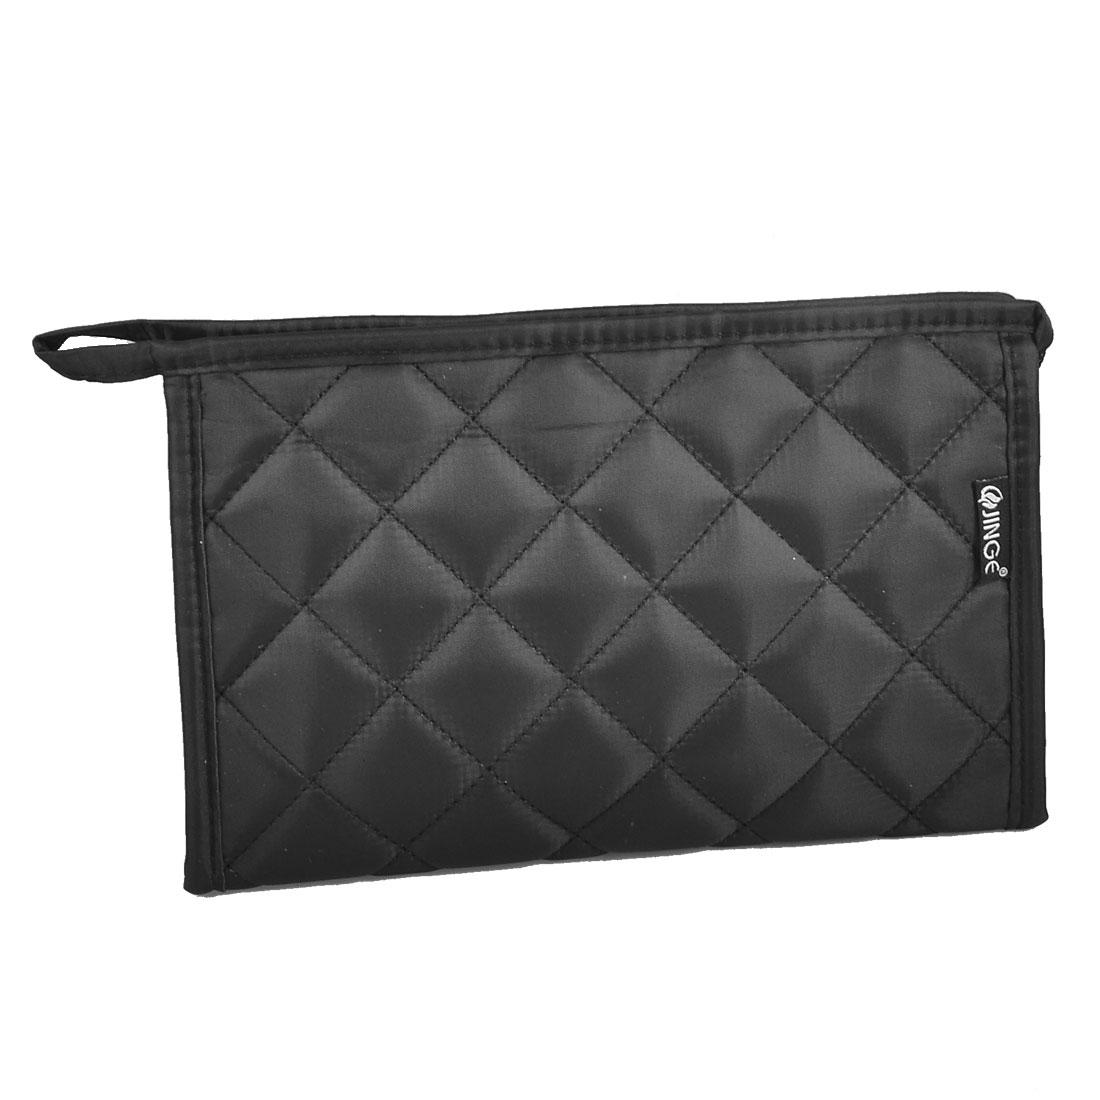 Travel Black Zipper Toiletry Case Makeup Cosmetic Bag Organizer w Mirror